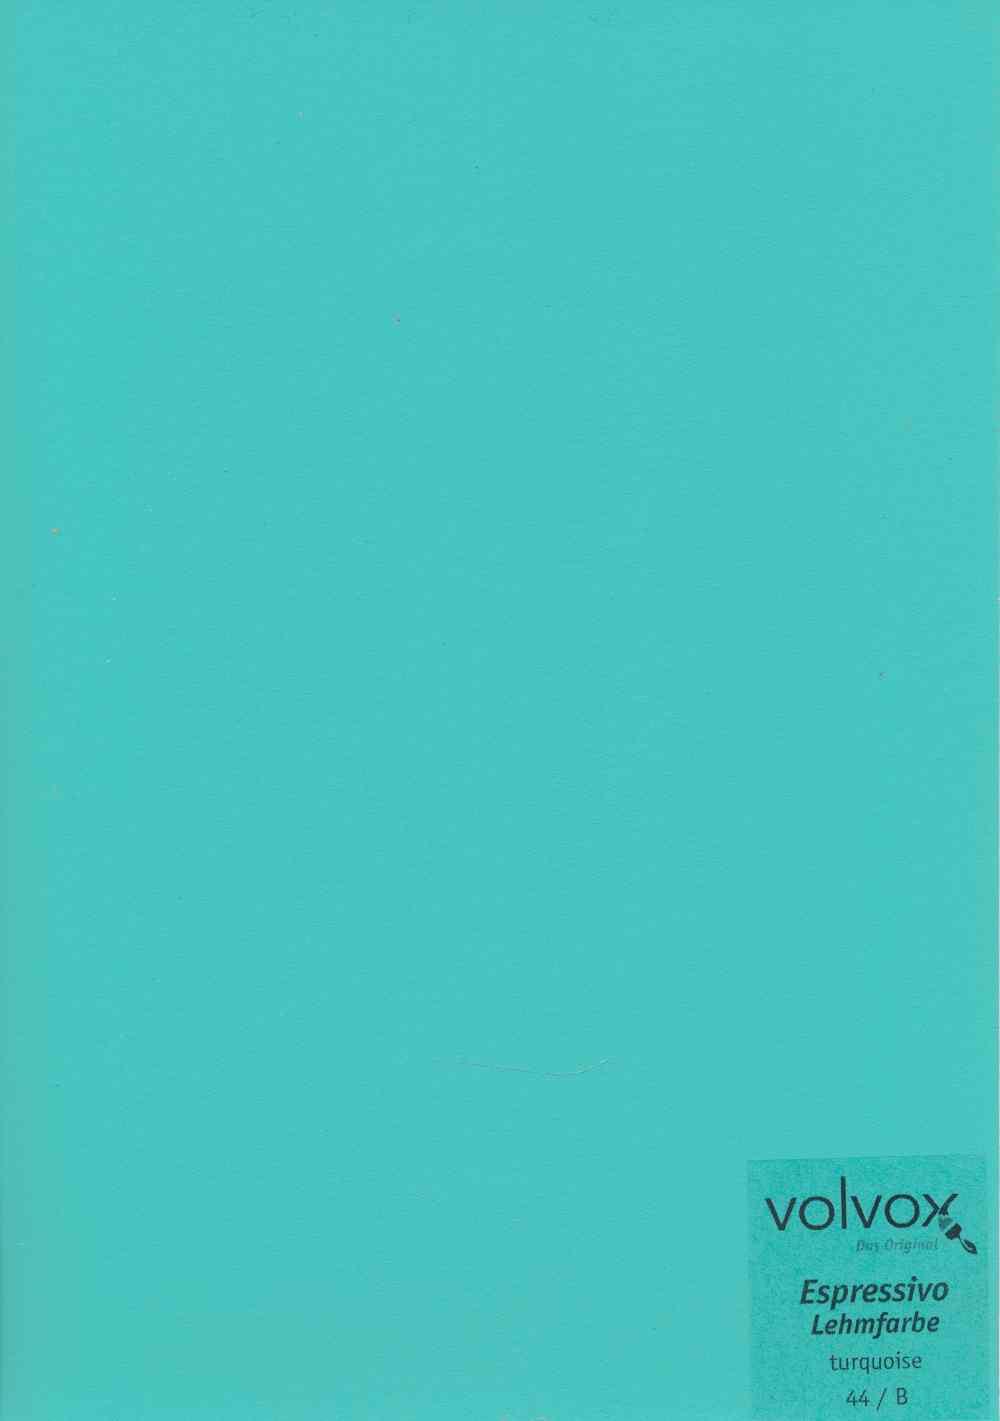 Volvox Espressivo Lehmfarbe 044 turquoise